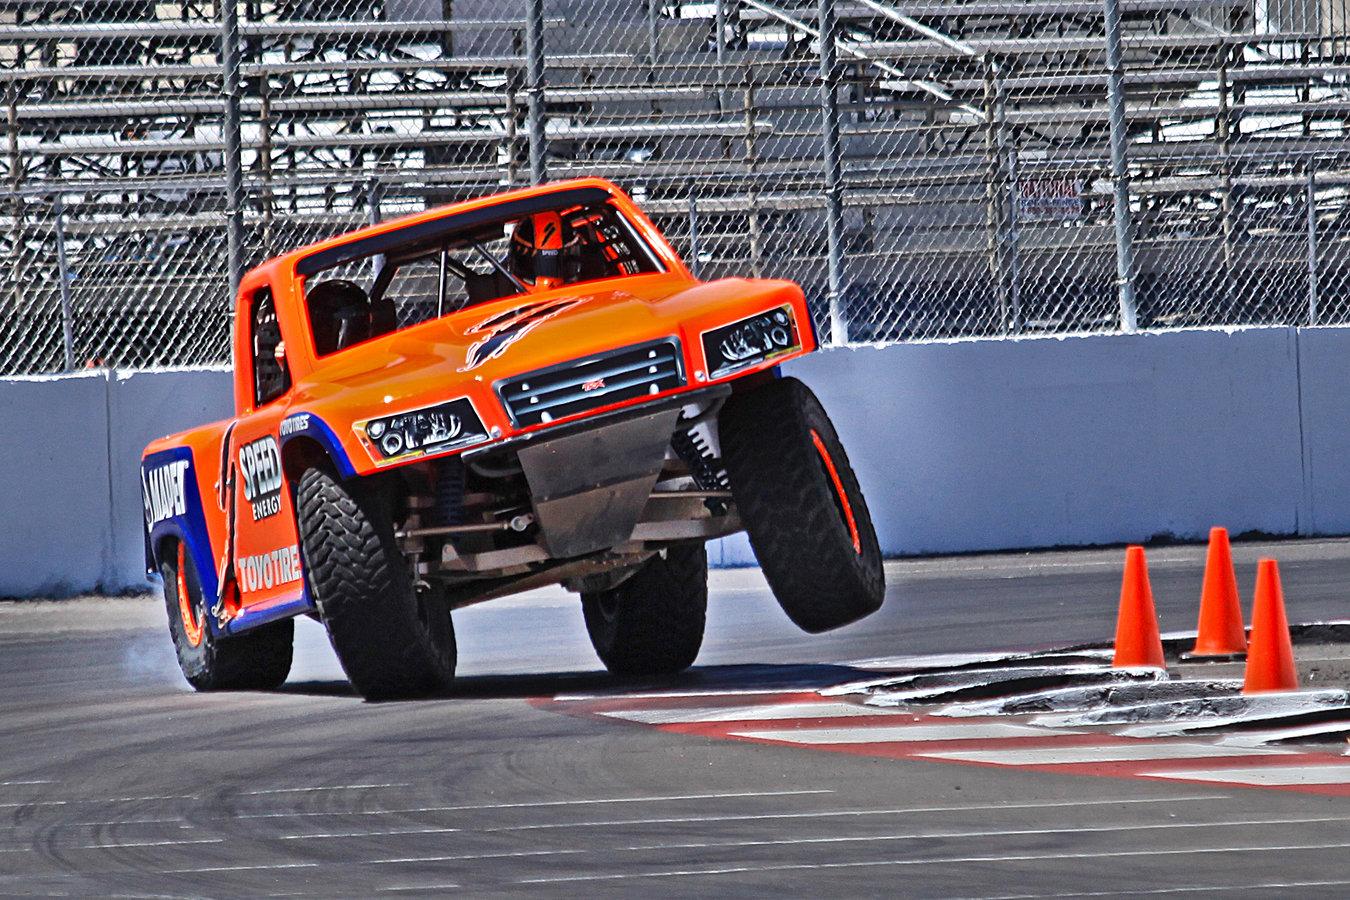 Mini Trophy Truck >> Stadium Super Trucks Are Like Mini Trophy Trucks And They